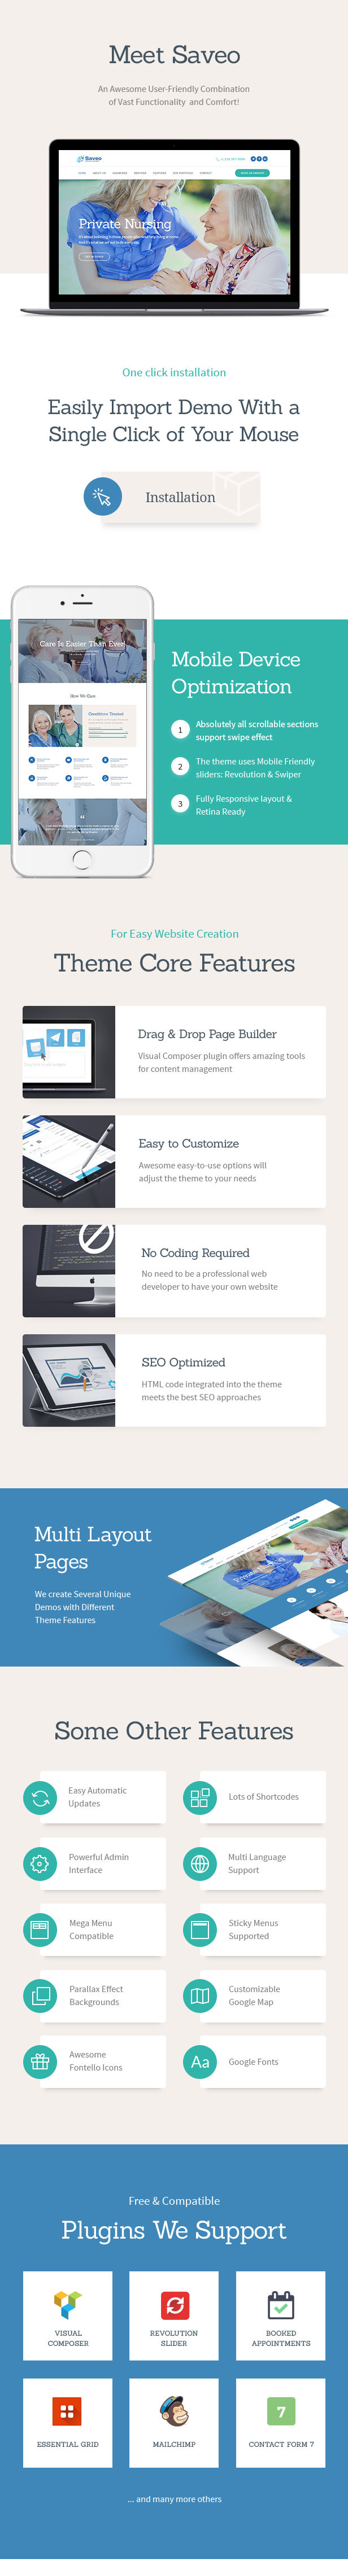 Saveo | In-home Care & Private Nursing Agency WordPress Theme - 1